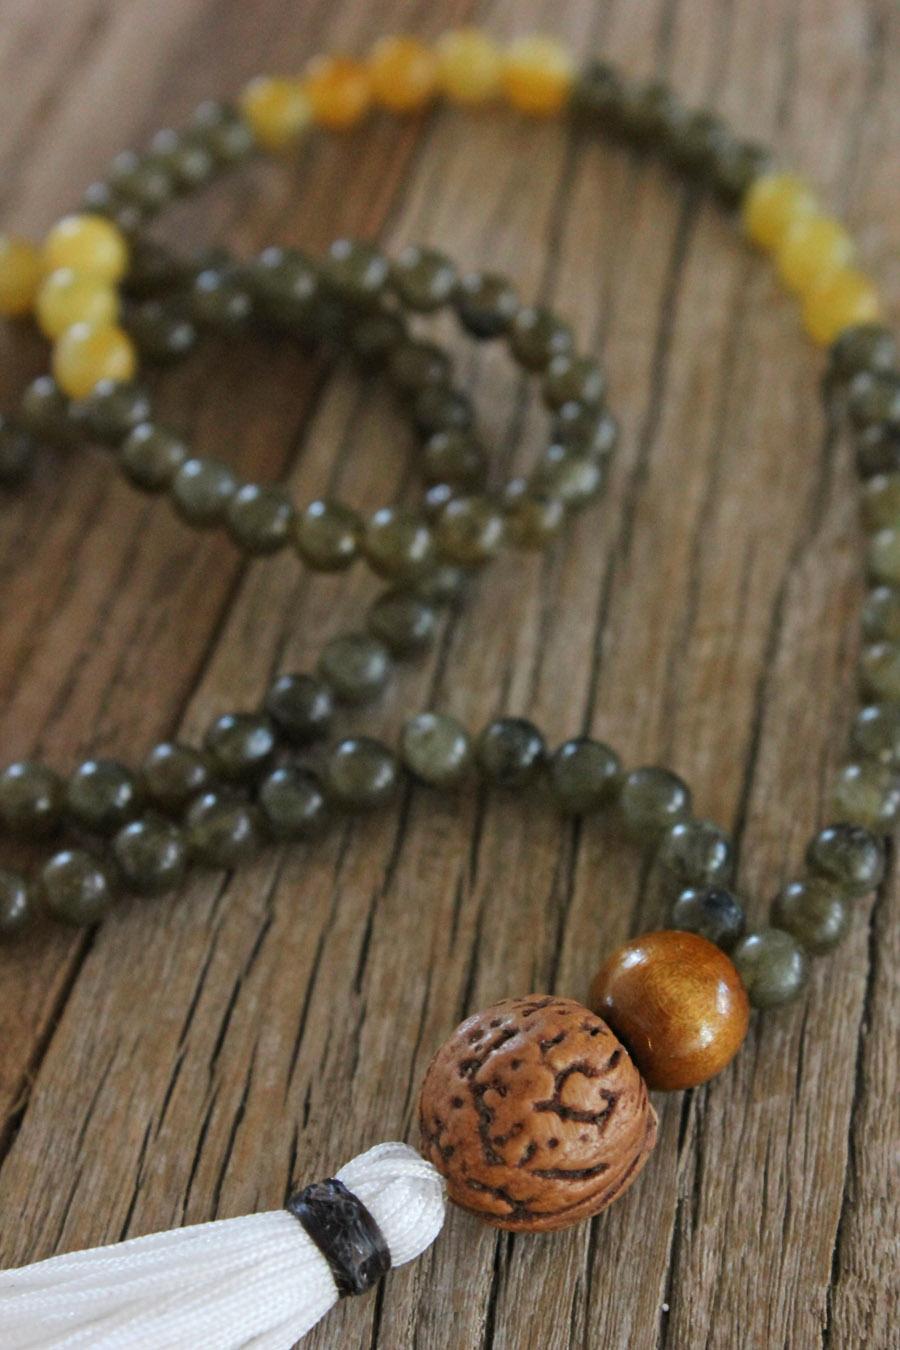 Green Labradorite, Serpentine and Peach Seed